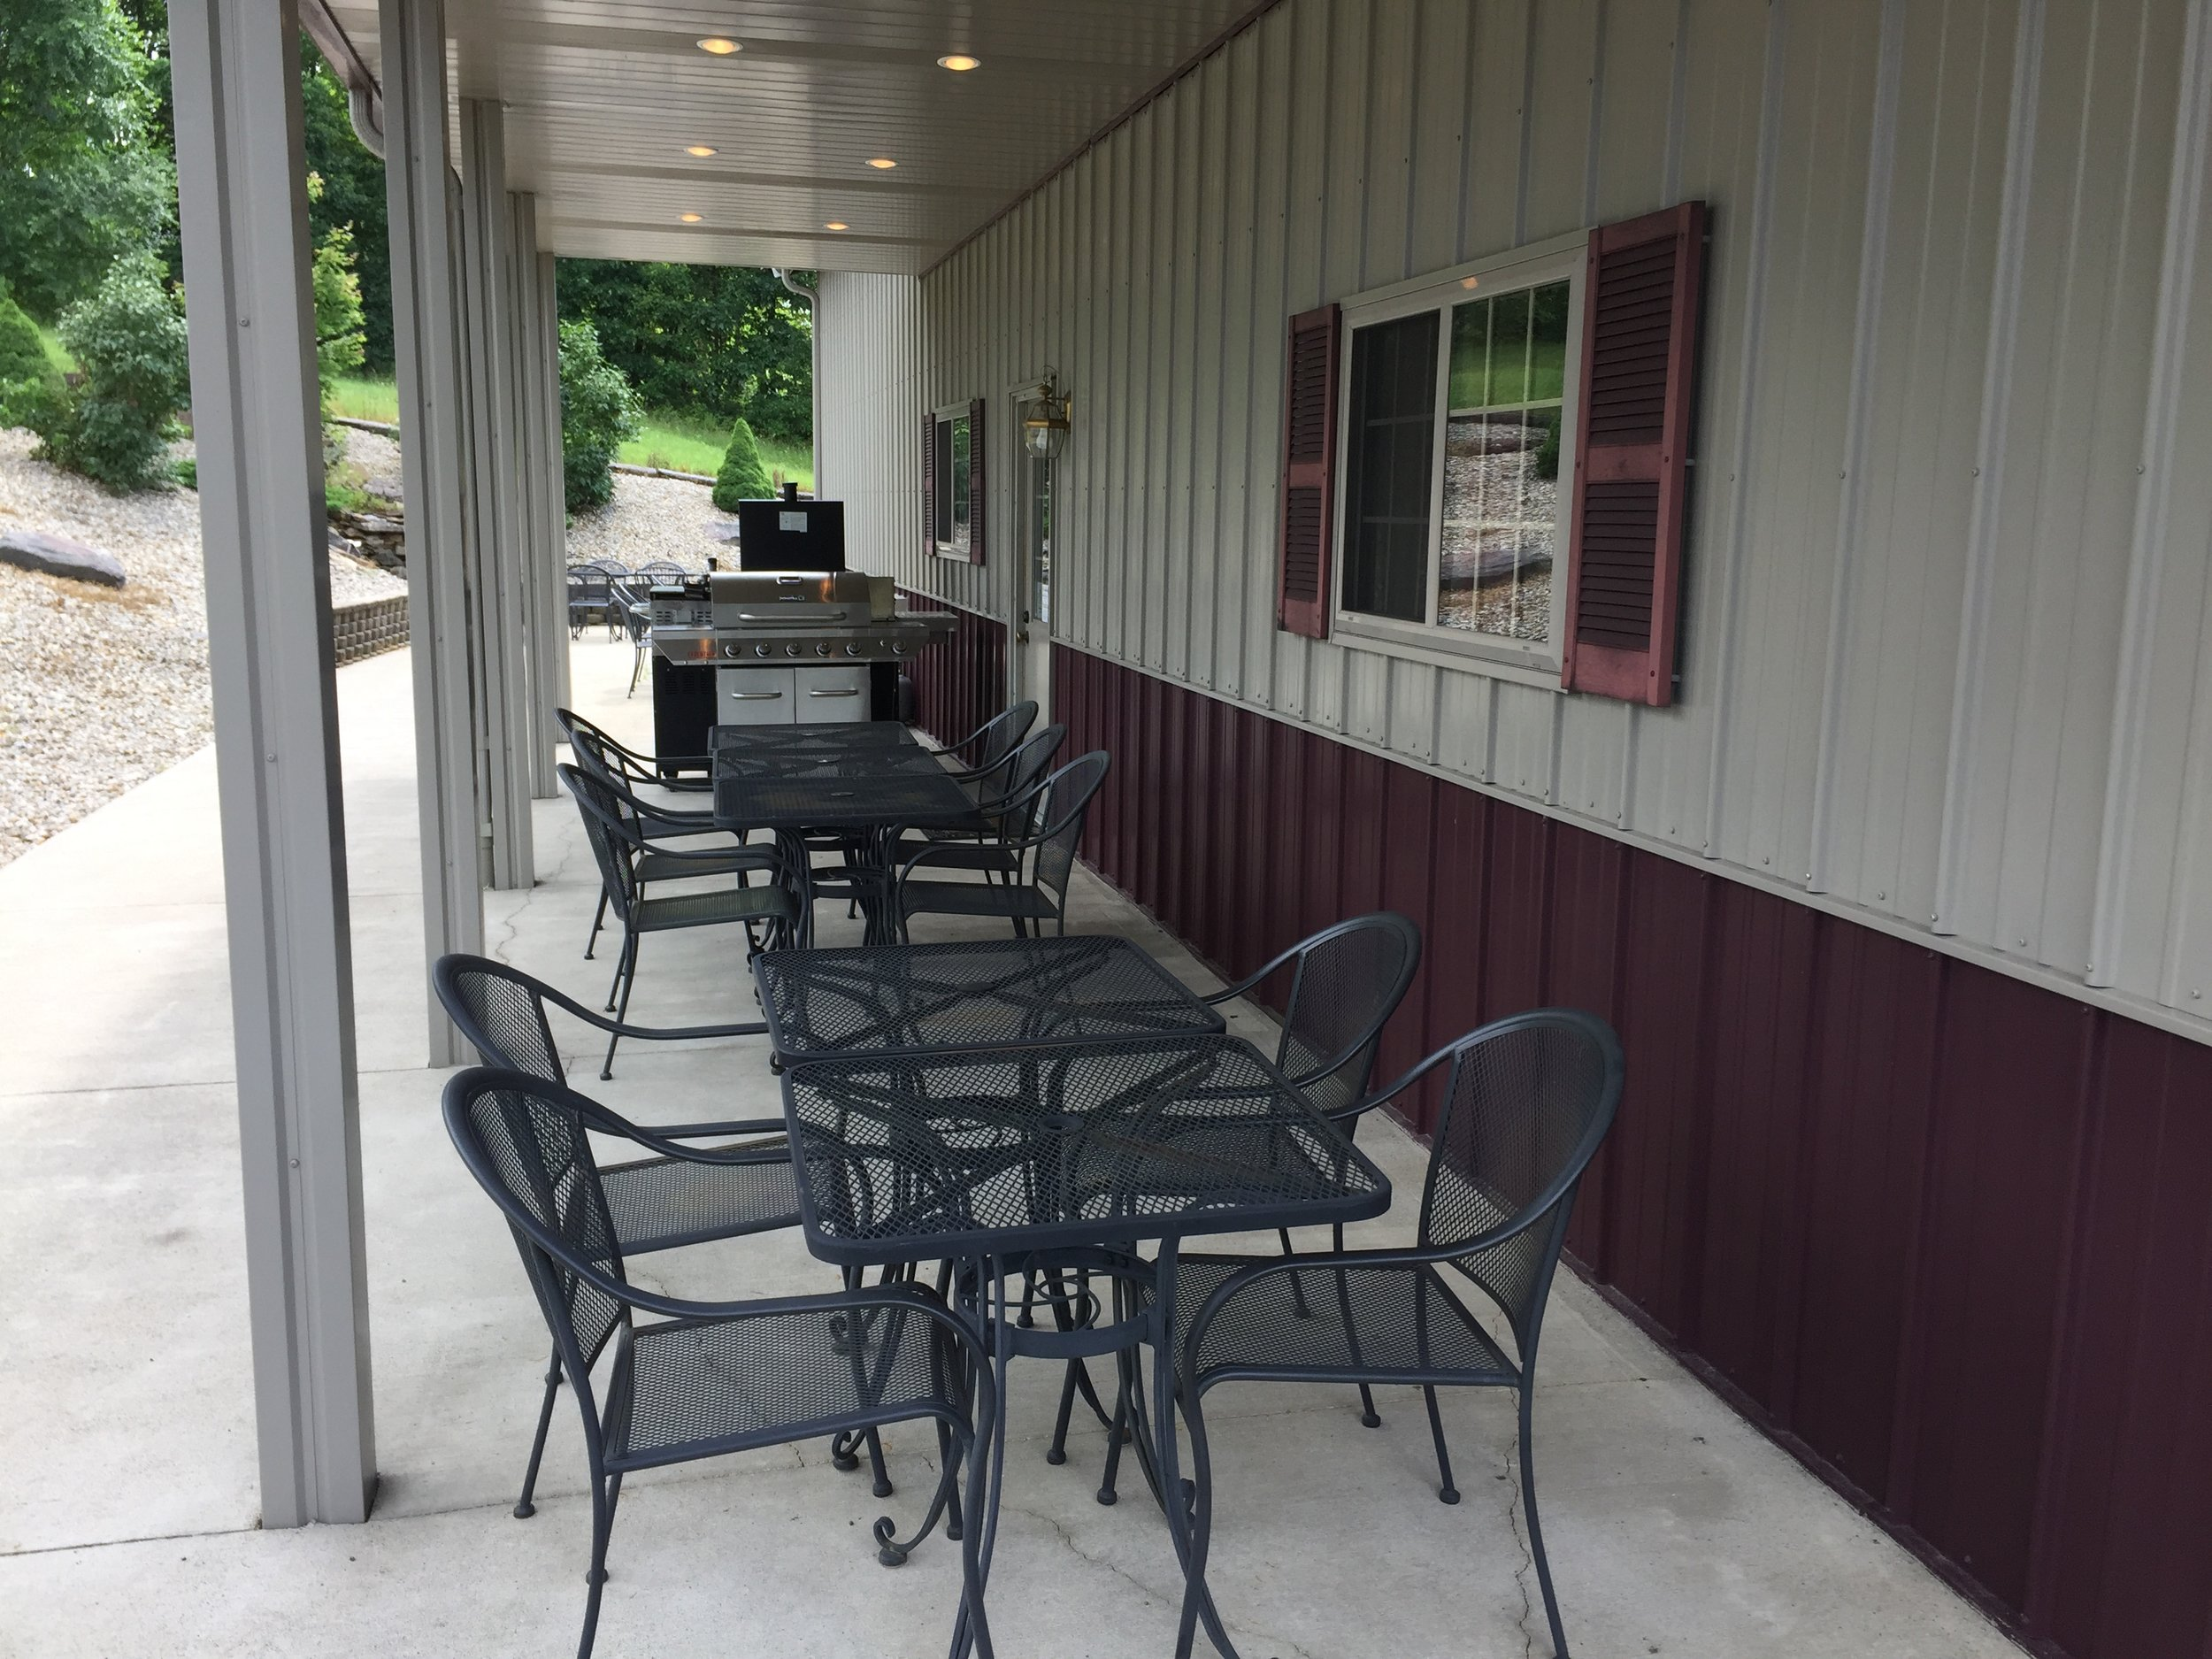 - 10310 O'Dell Rd., Frazeysburg, OH 43822Click for Map740-828-WINE(9463)stonecrestvine.comAppalachian Wine TrailMuskingum County